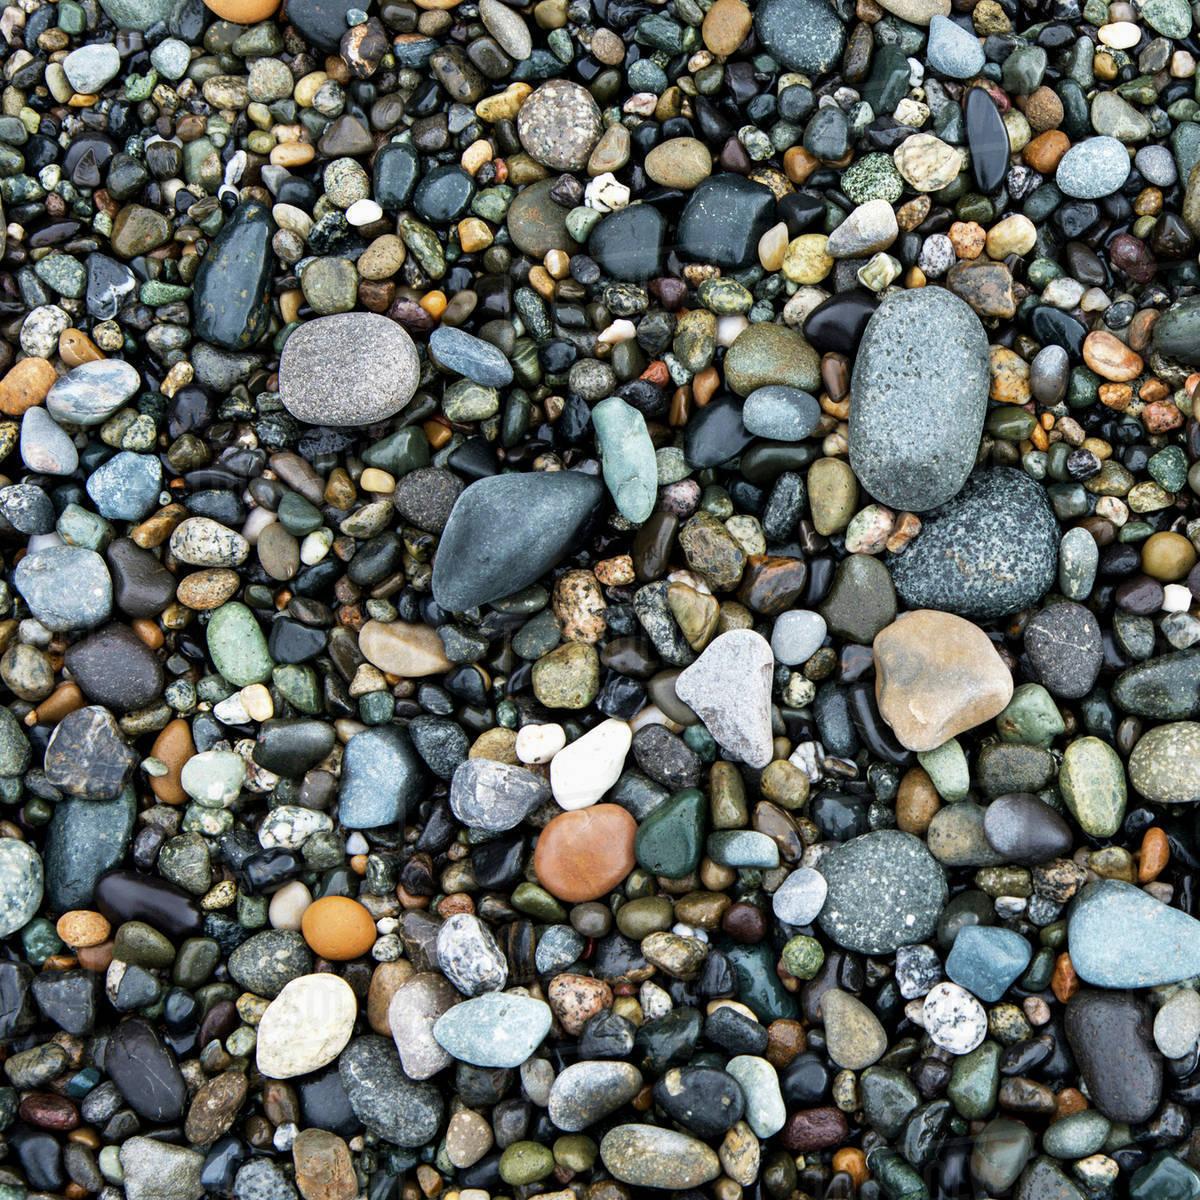 Wet Rocks On The Beach